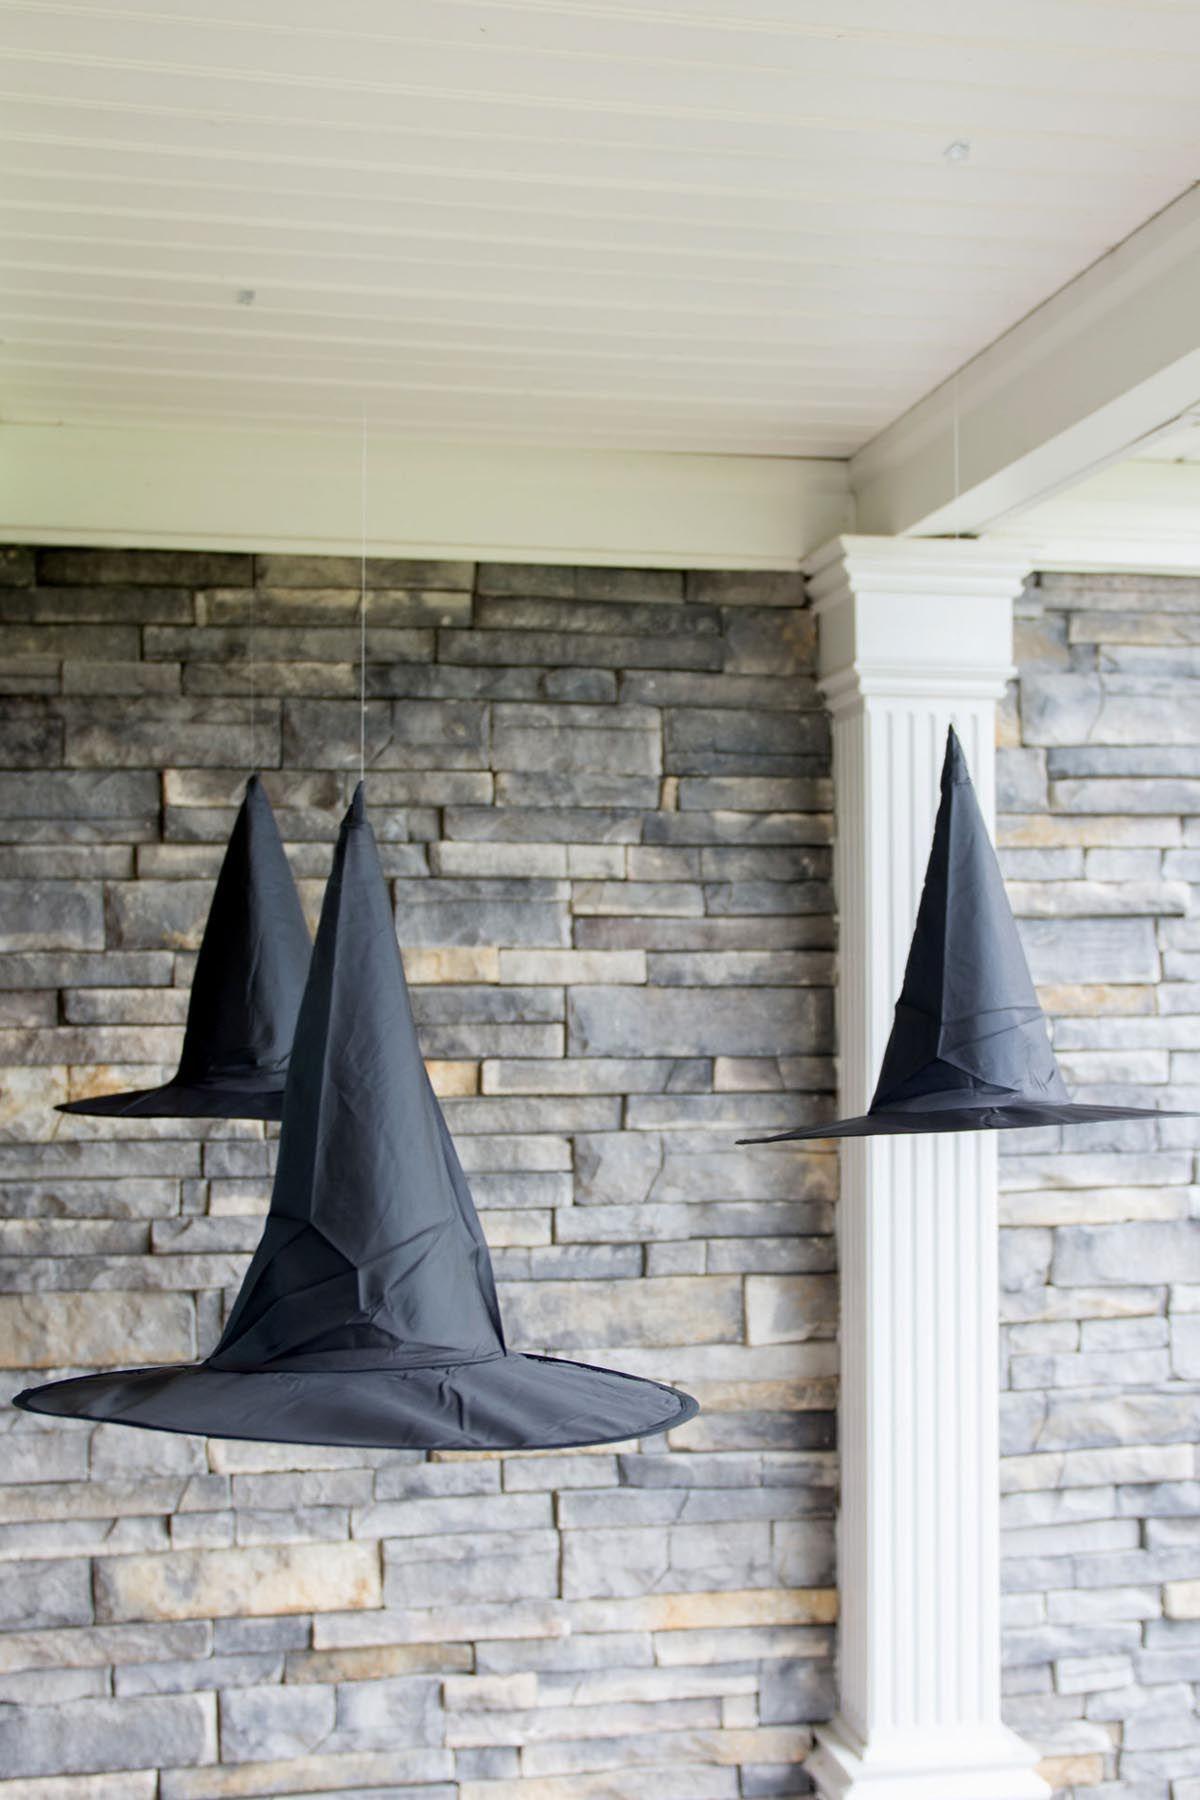 54 Easy Halloween Decorations - Spooky Home Decor Ideas for Halloween